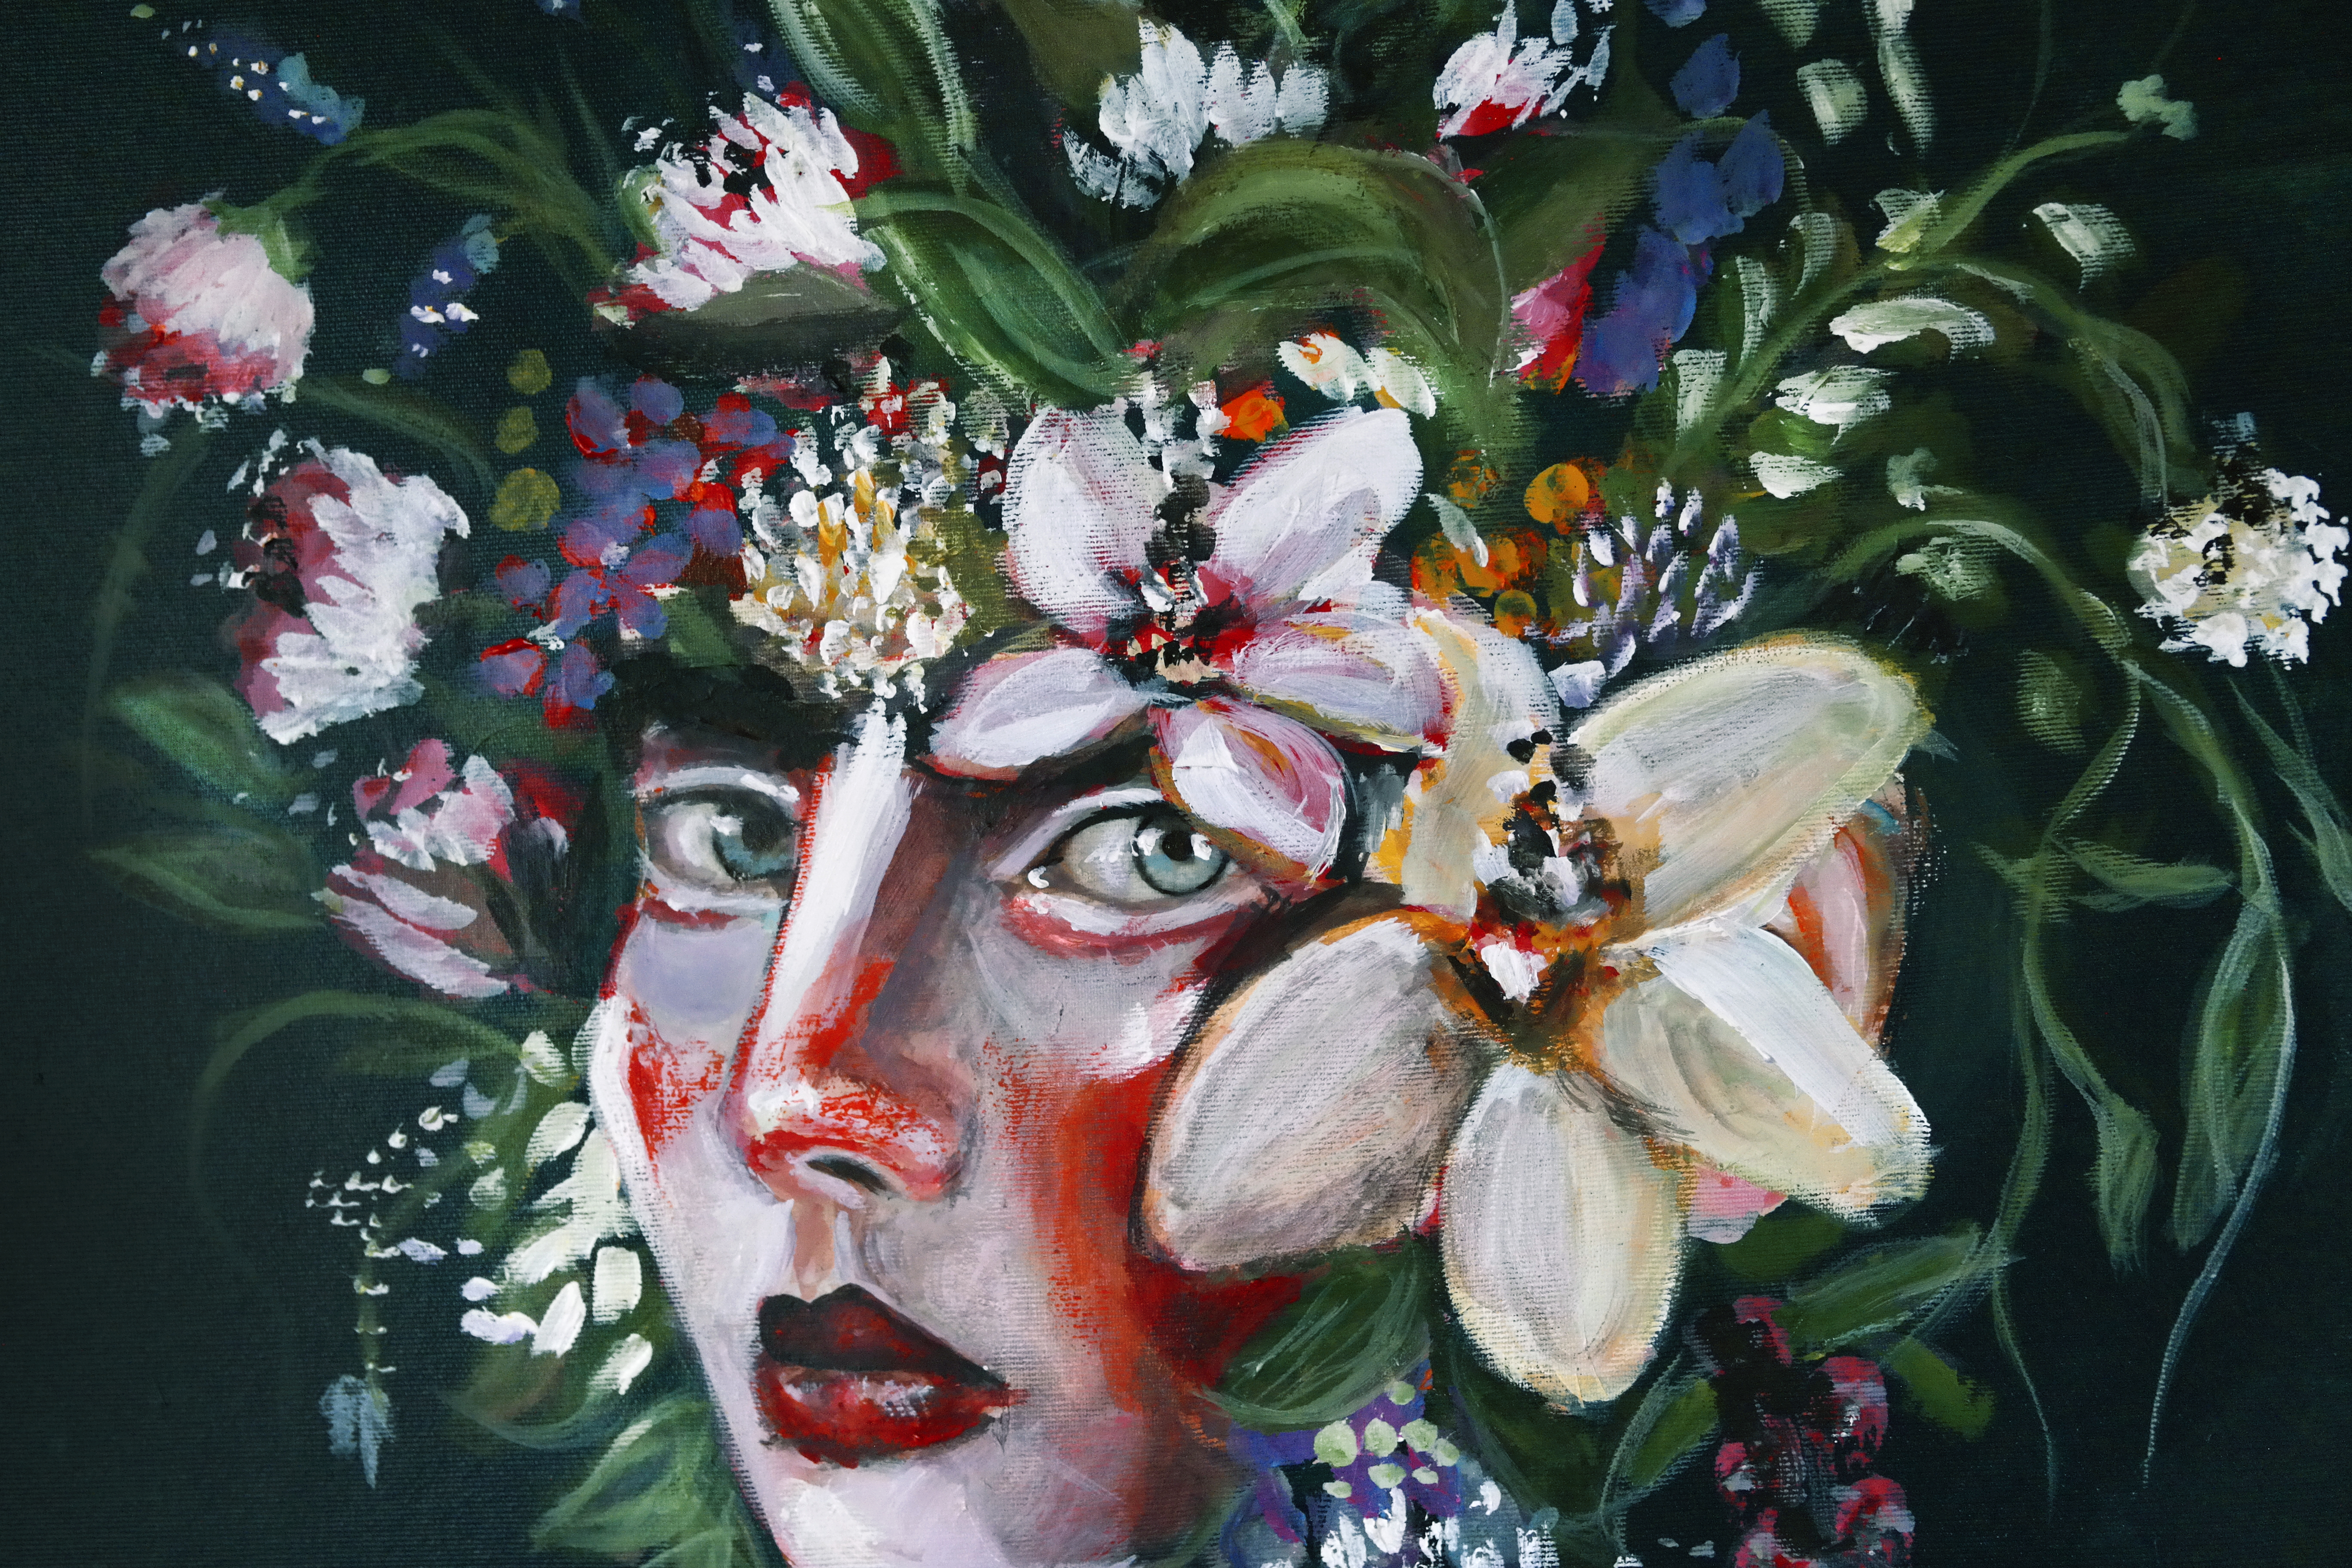 lisboa-flores-mulher-woman-2019